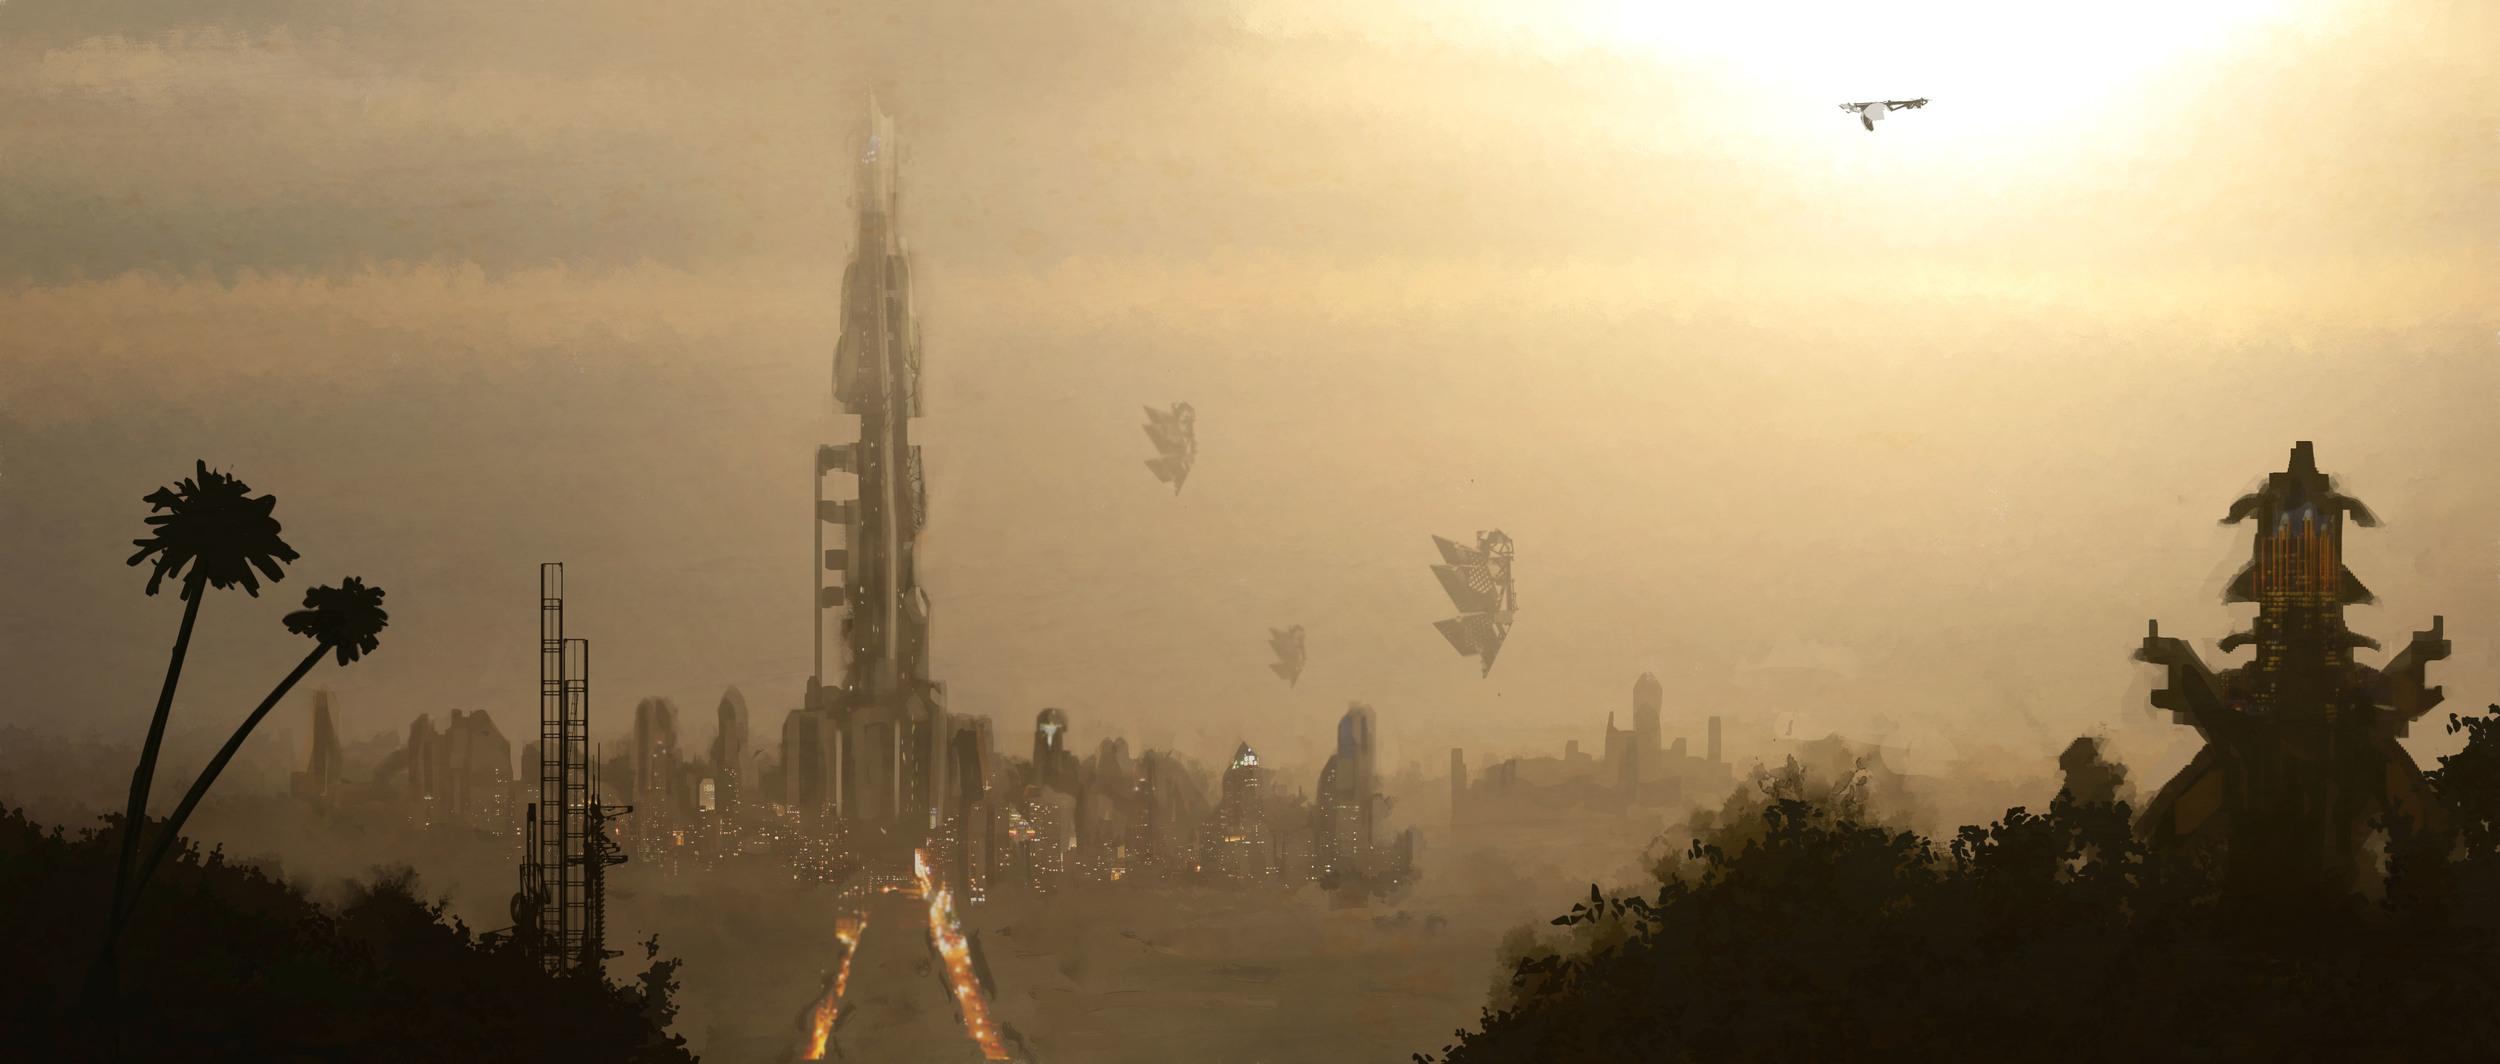 Agrarian Utopia - The Space Needle